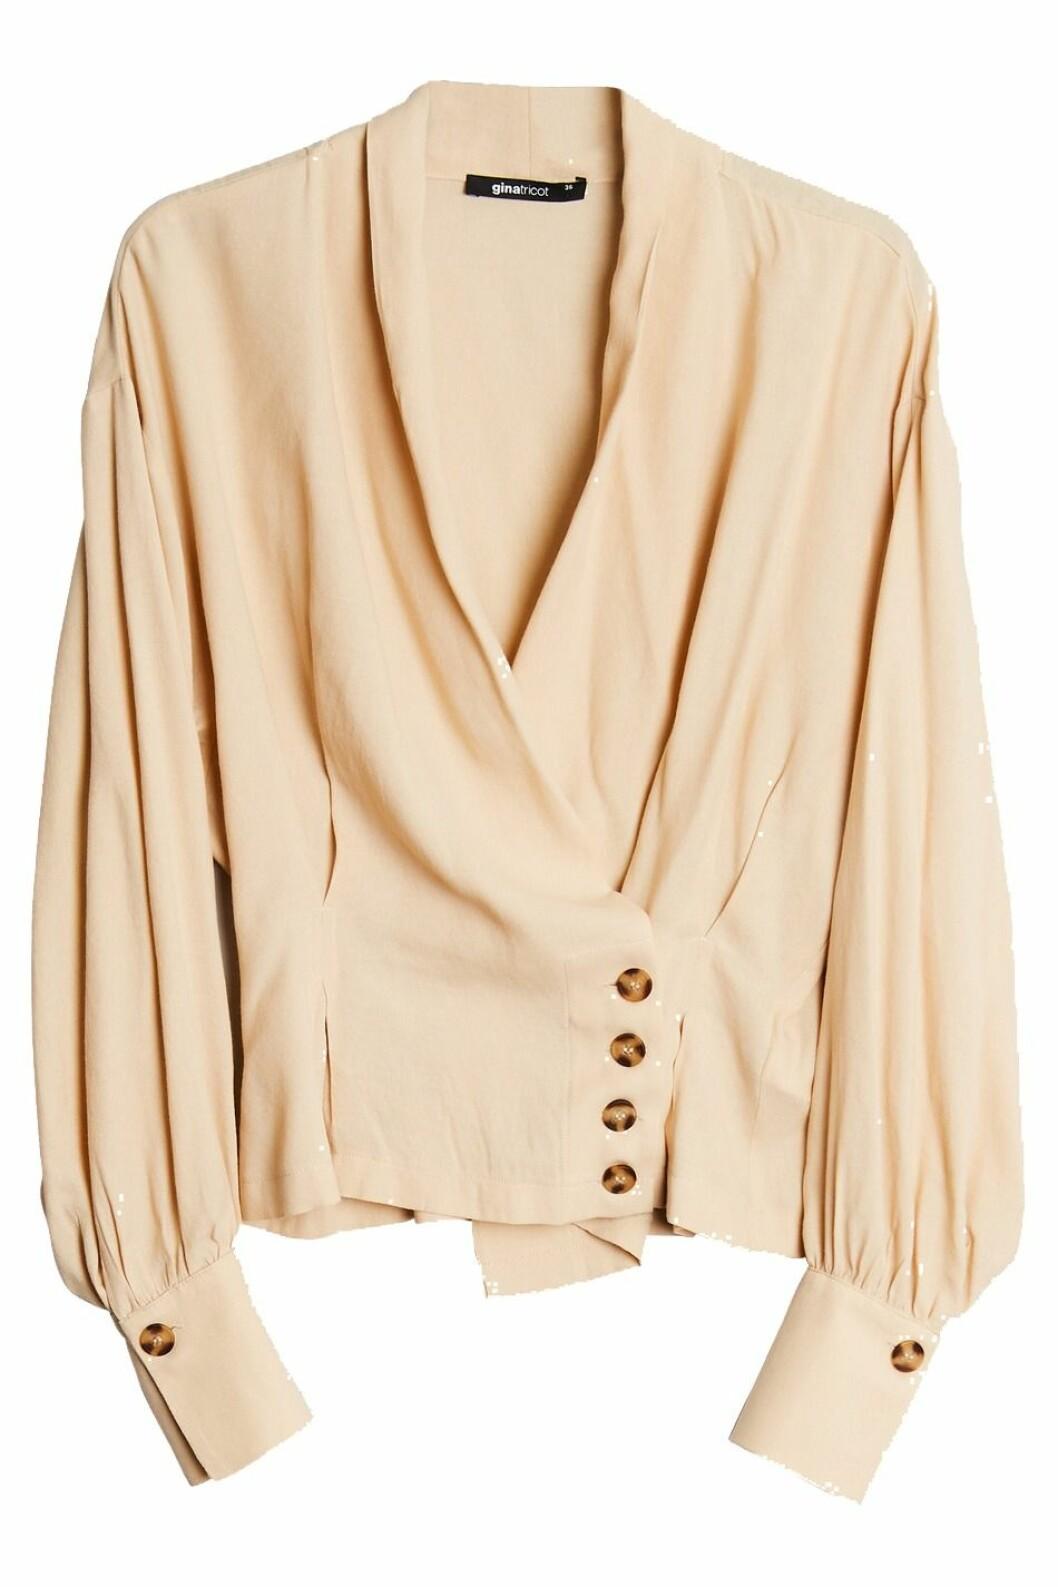 Beige blus från Gina tricot